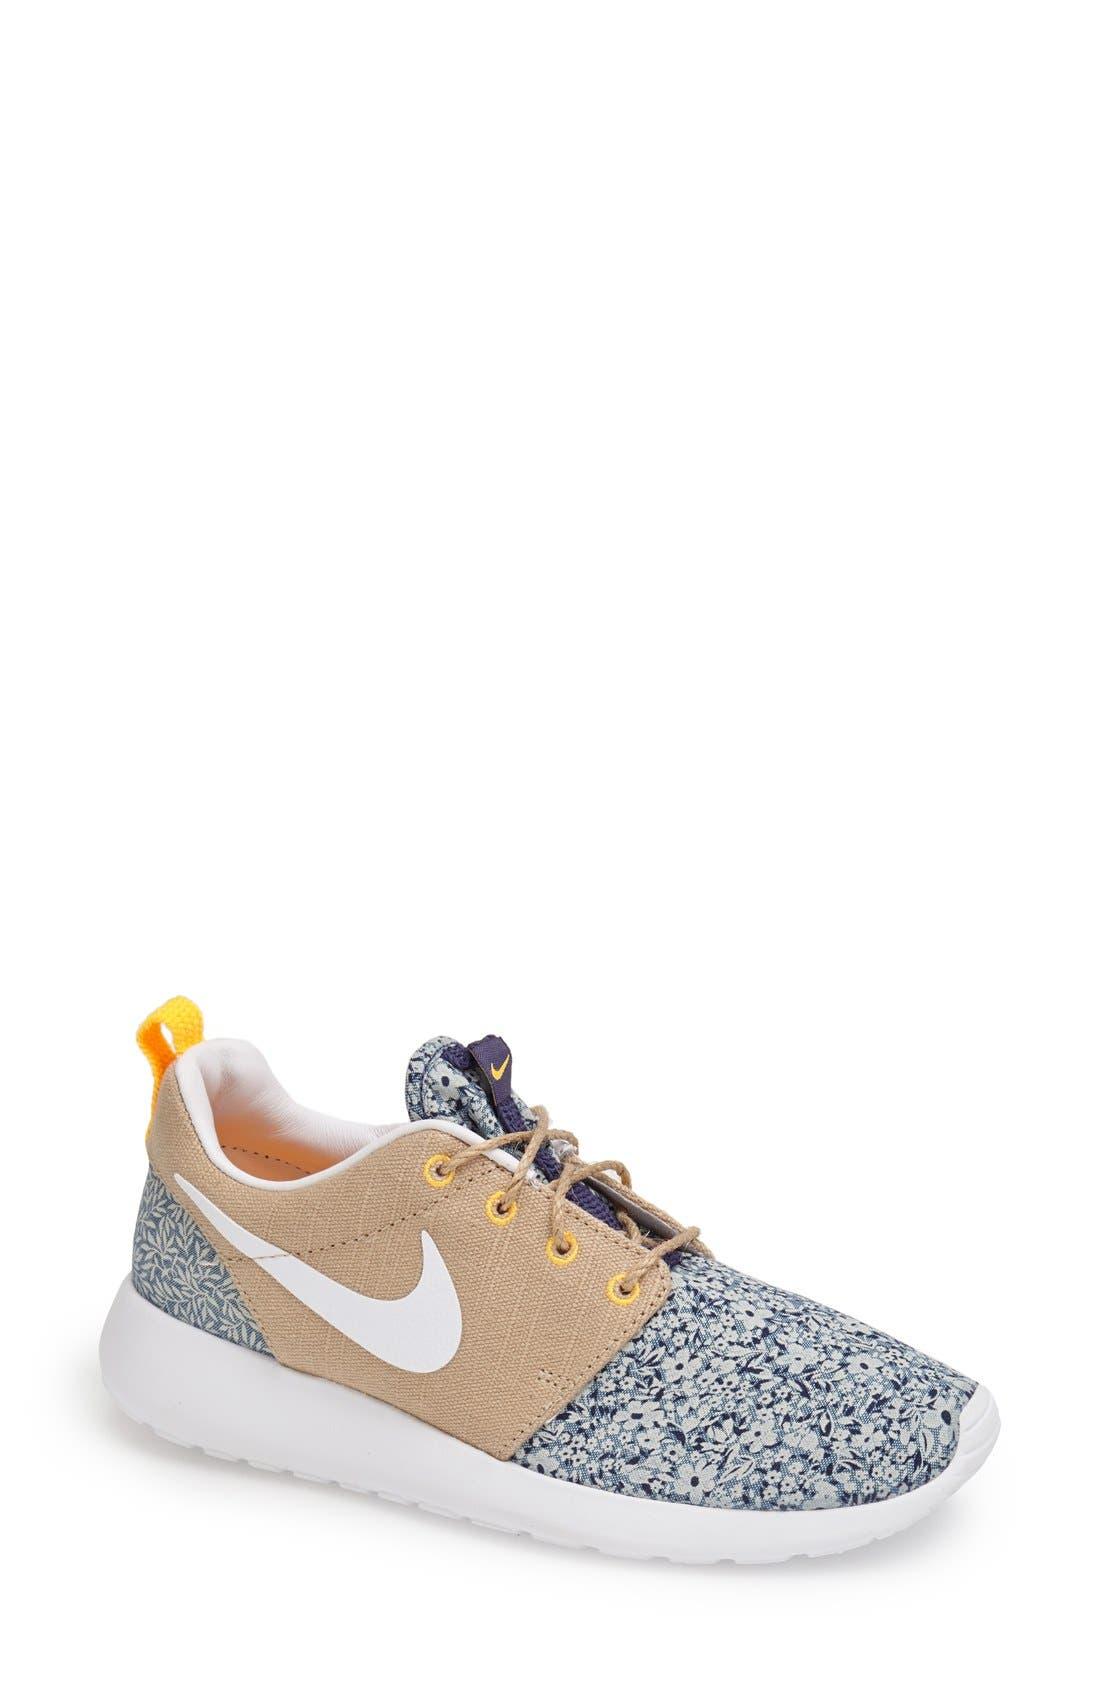 Alternate Image 1 Selected - Nike 'Roshe Run - Liberty' Sneaker (Women)